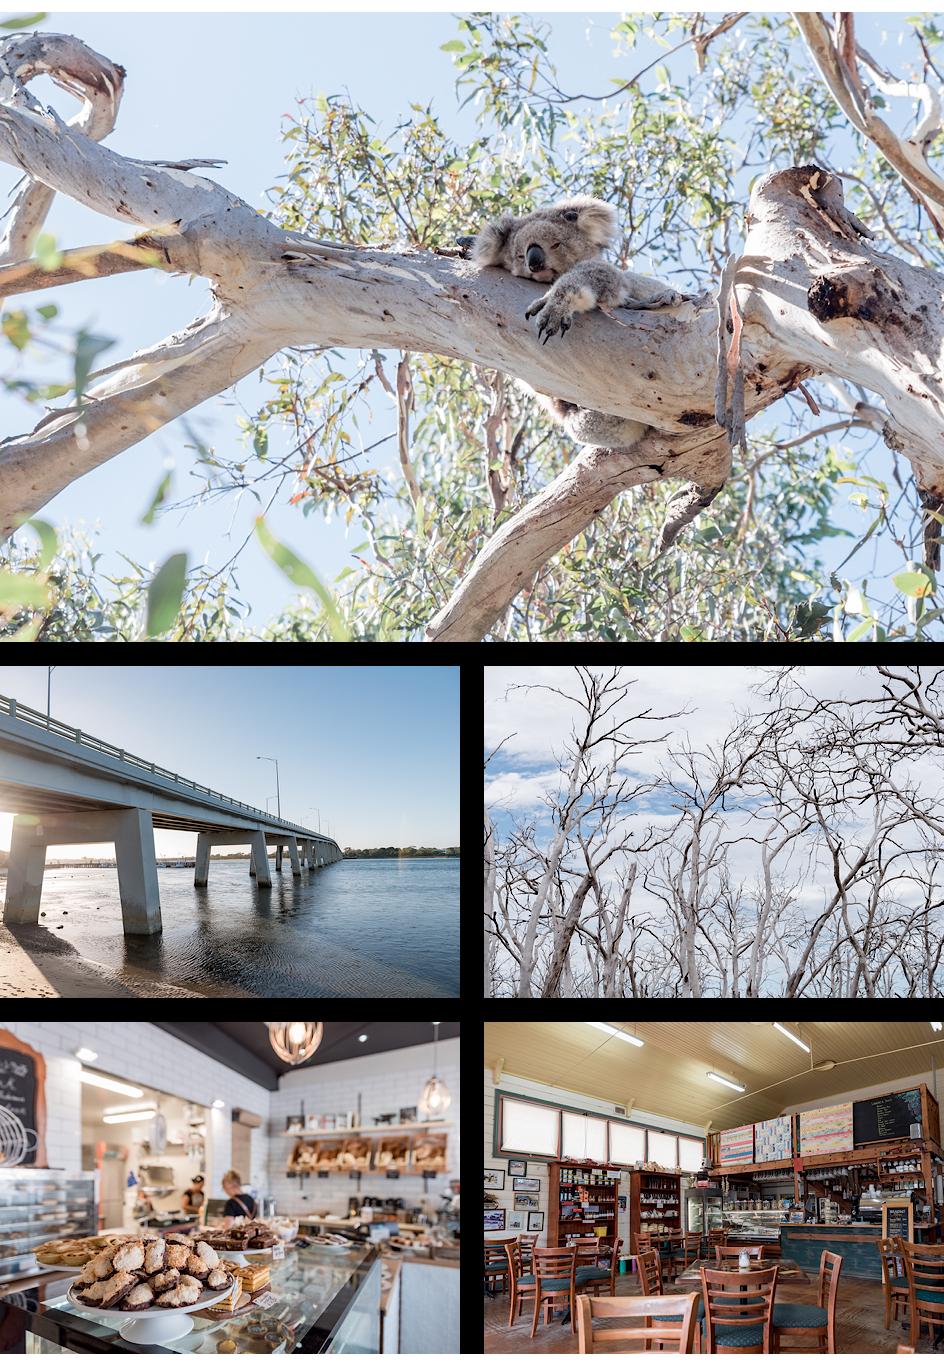 Koala Conservation Centre, Brücke nach Phillip Island, Gum-Trees, Pandesal Bakery, Café in der Nähe von Bairnsdale